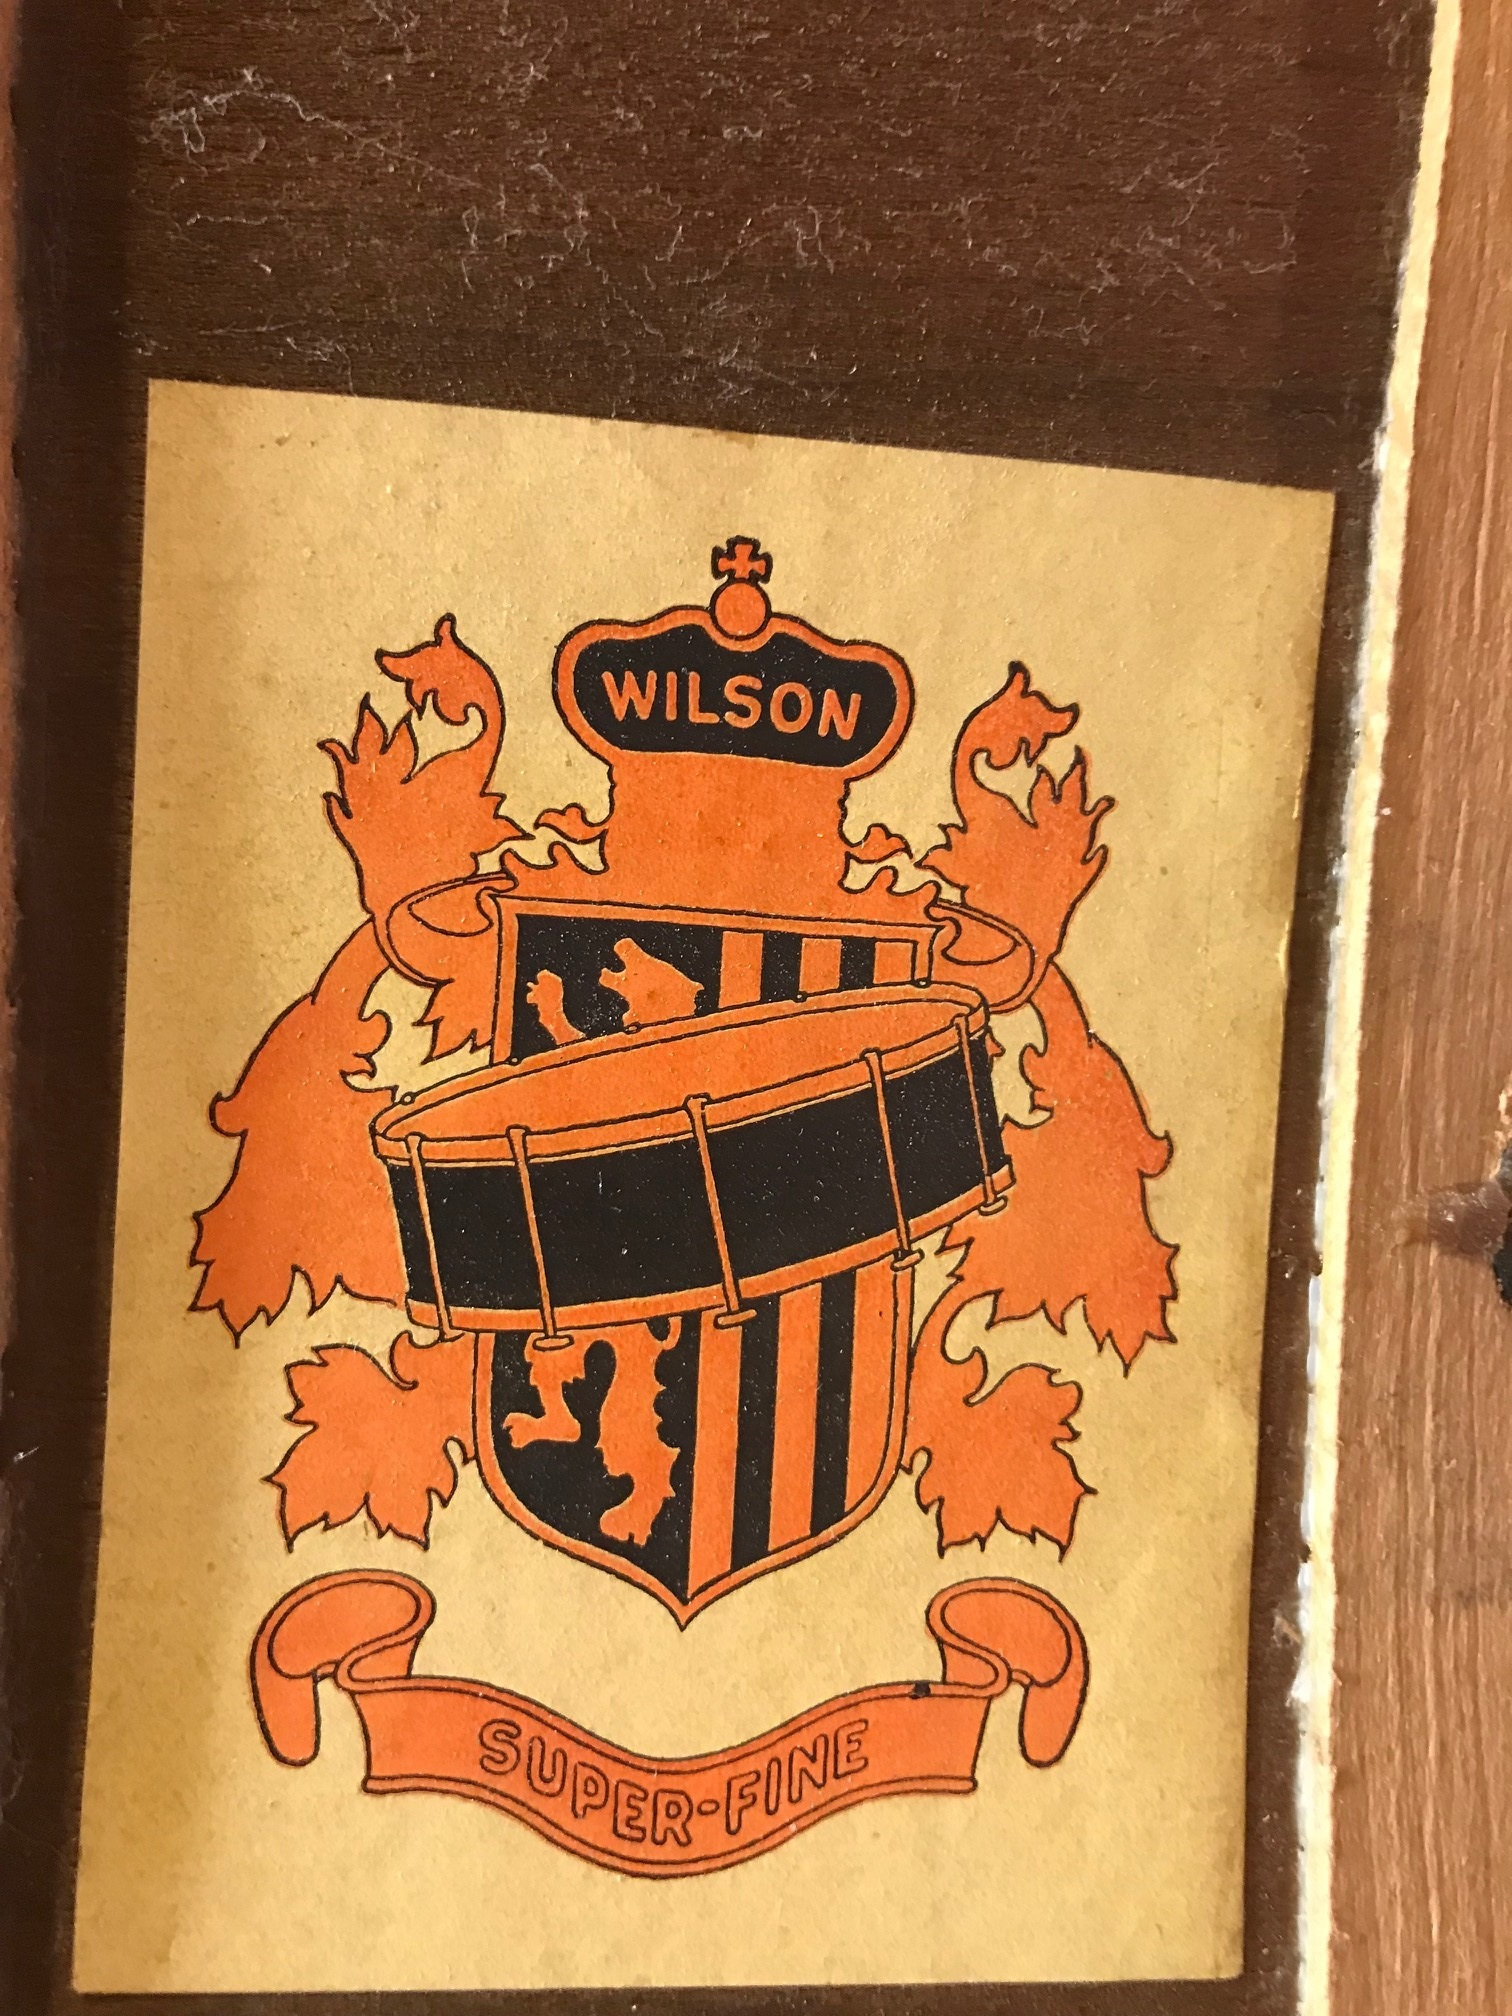 "Wilson Brothers 28"" Bass Drum: wilson badge"